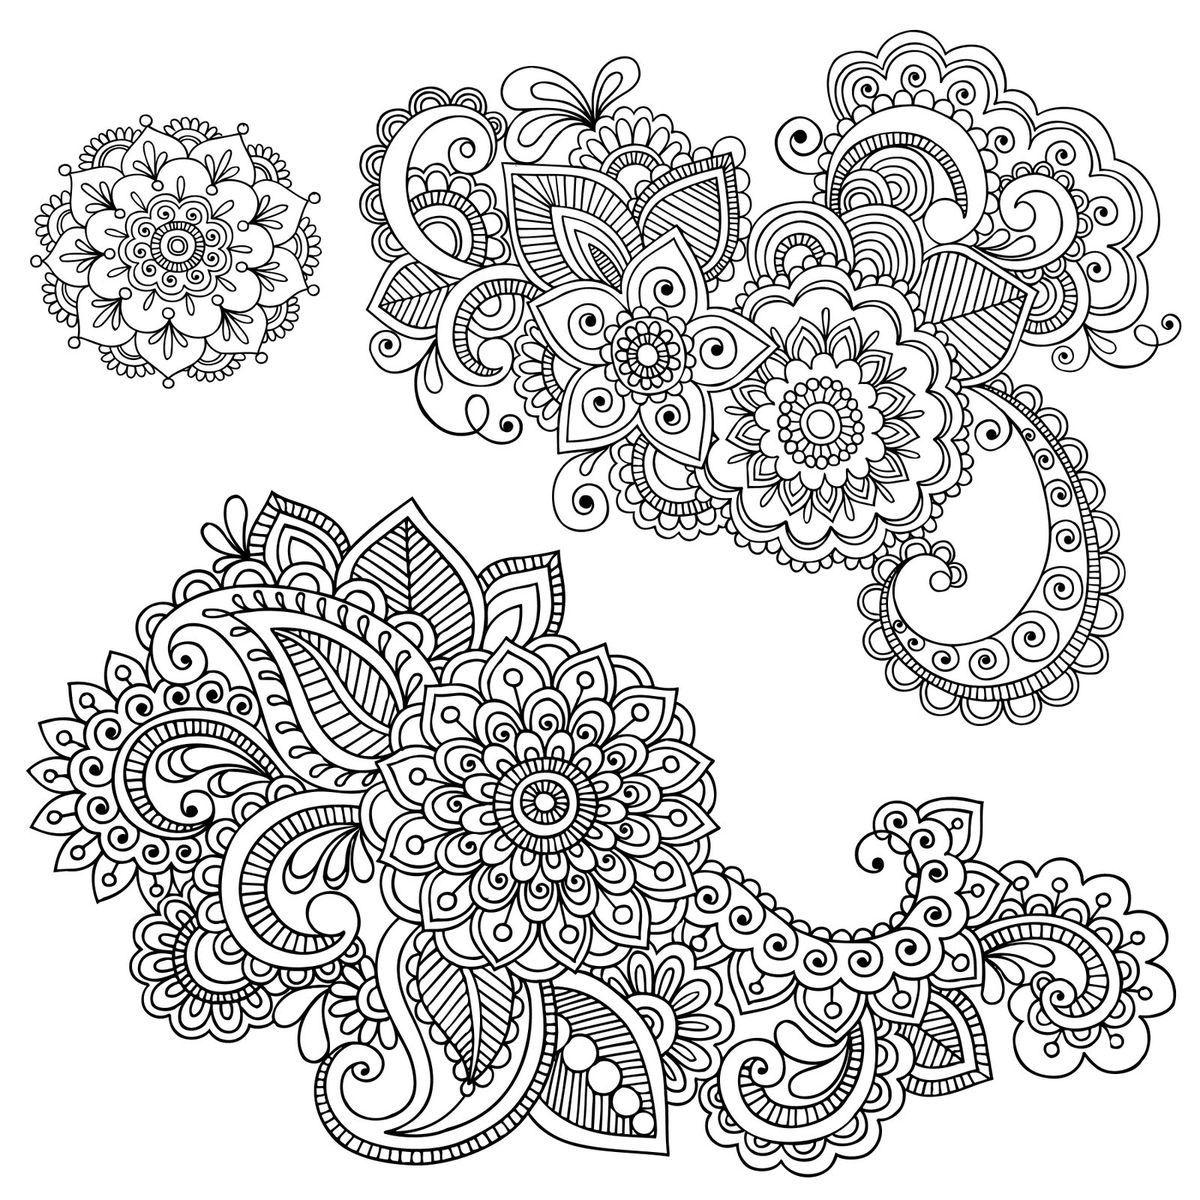 Pin von Raya auf Indian ornaments & Pattern   Pinterest   Muster